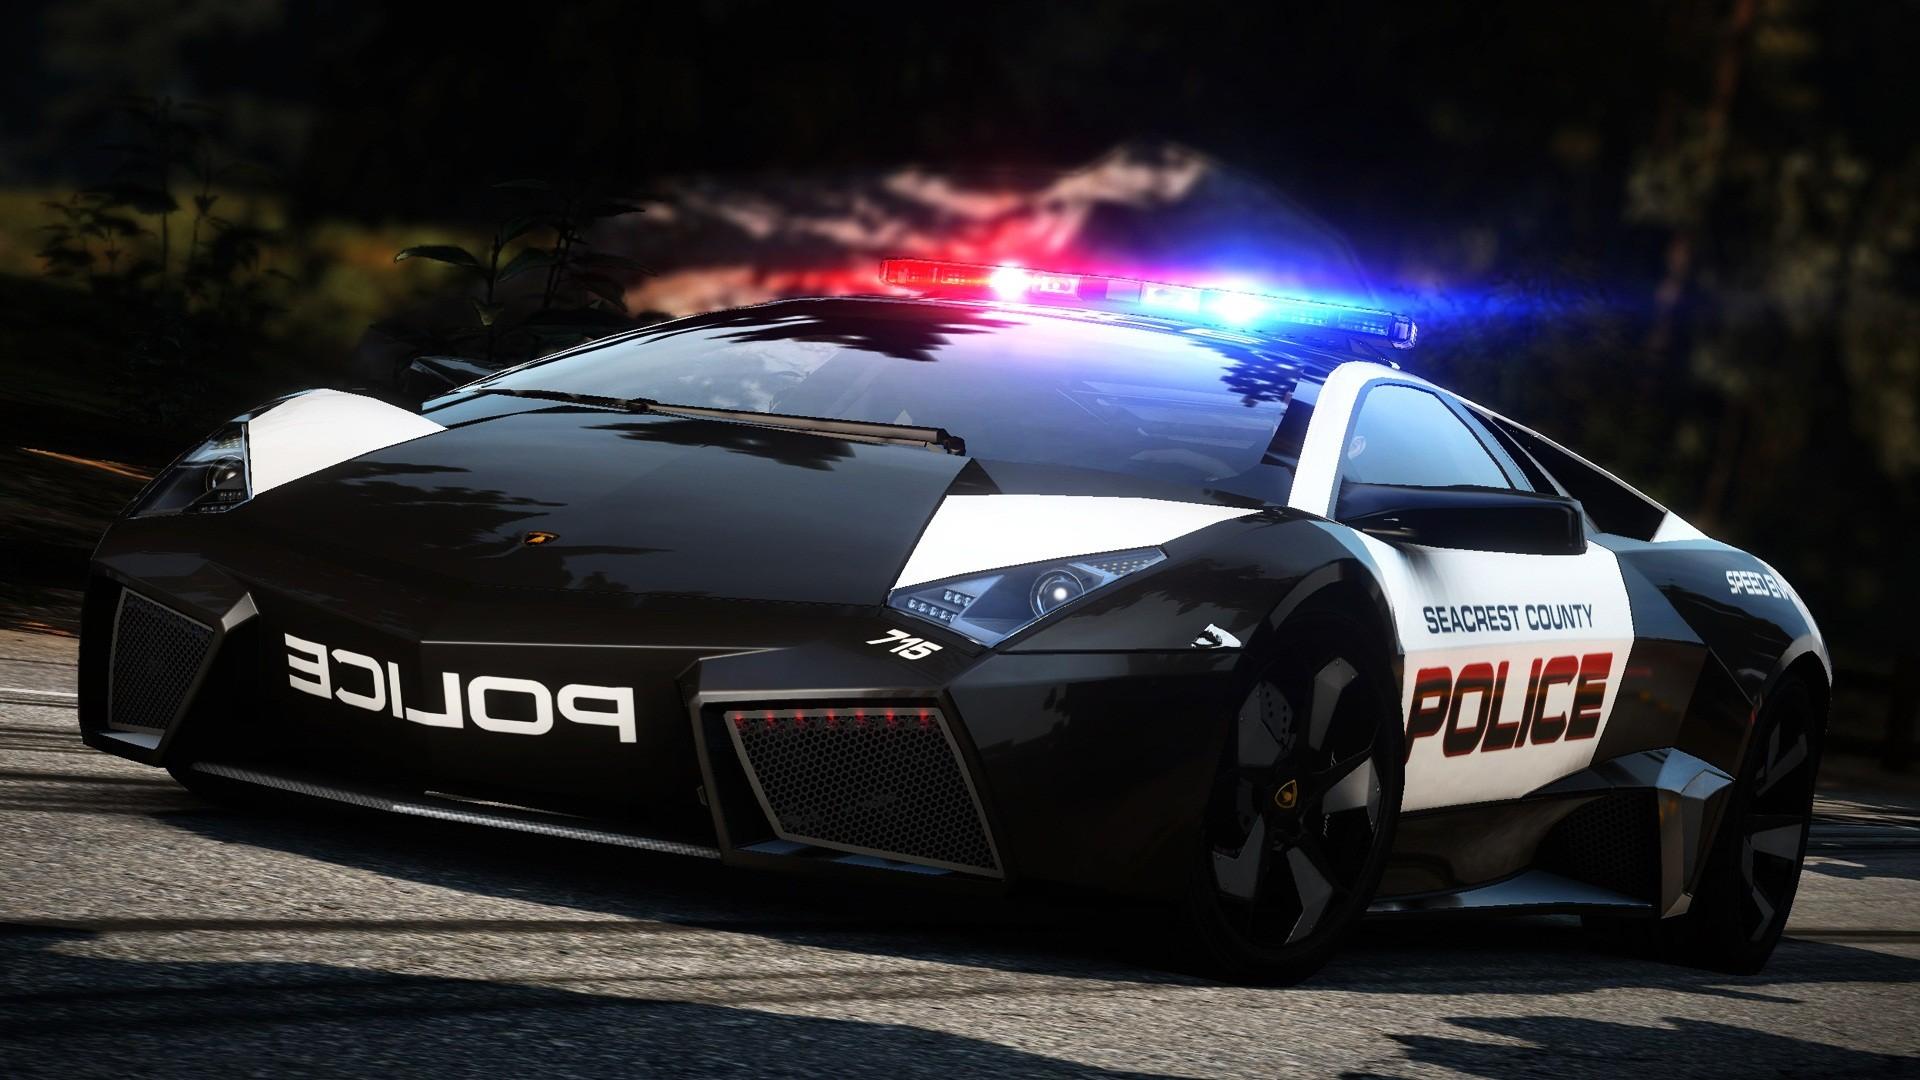 Police Car Wallpaper Hd Lamborghini Reventon Hot Pursuit Wallpapers Hd